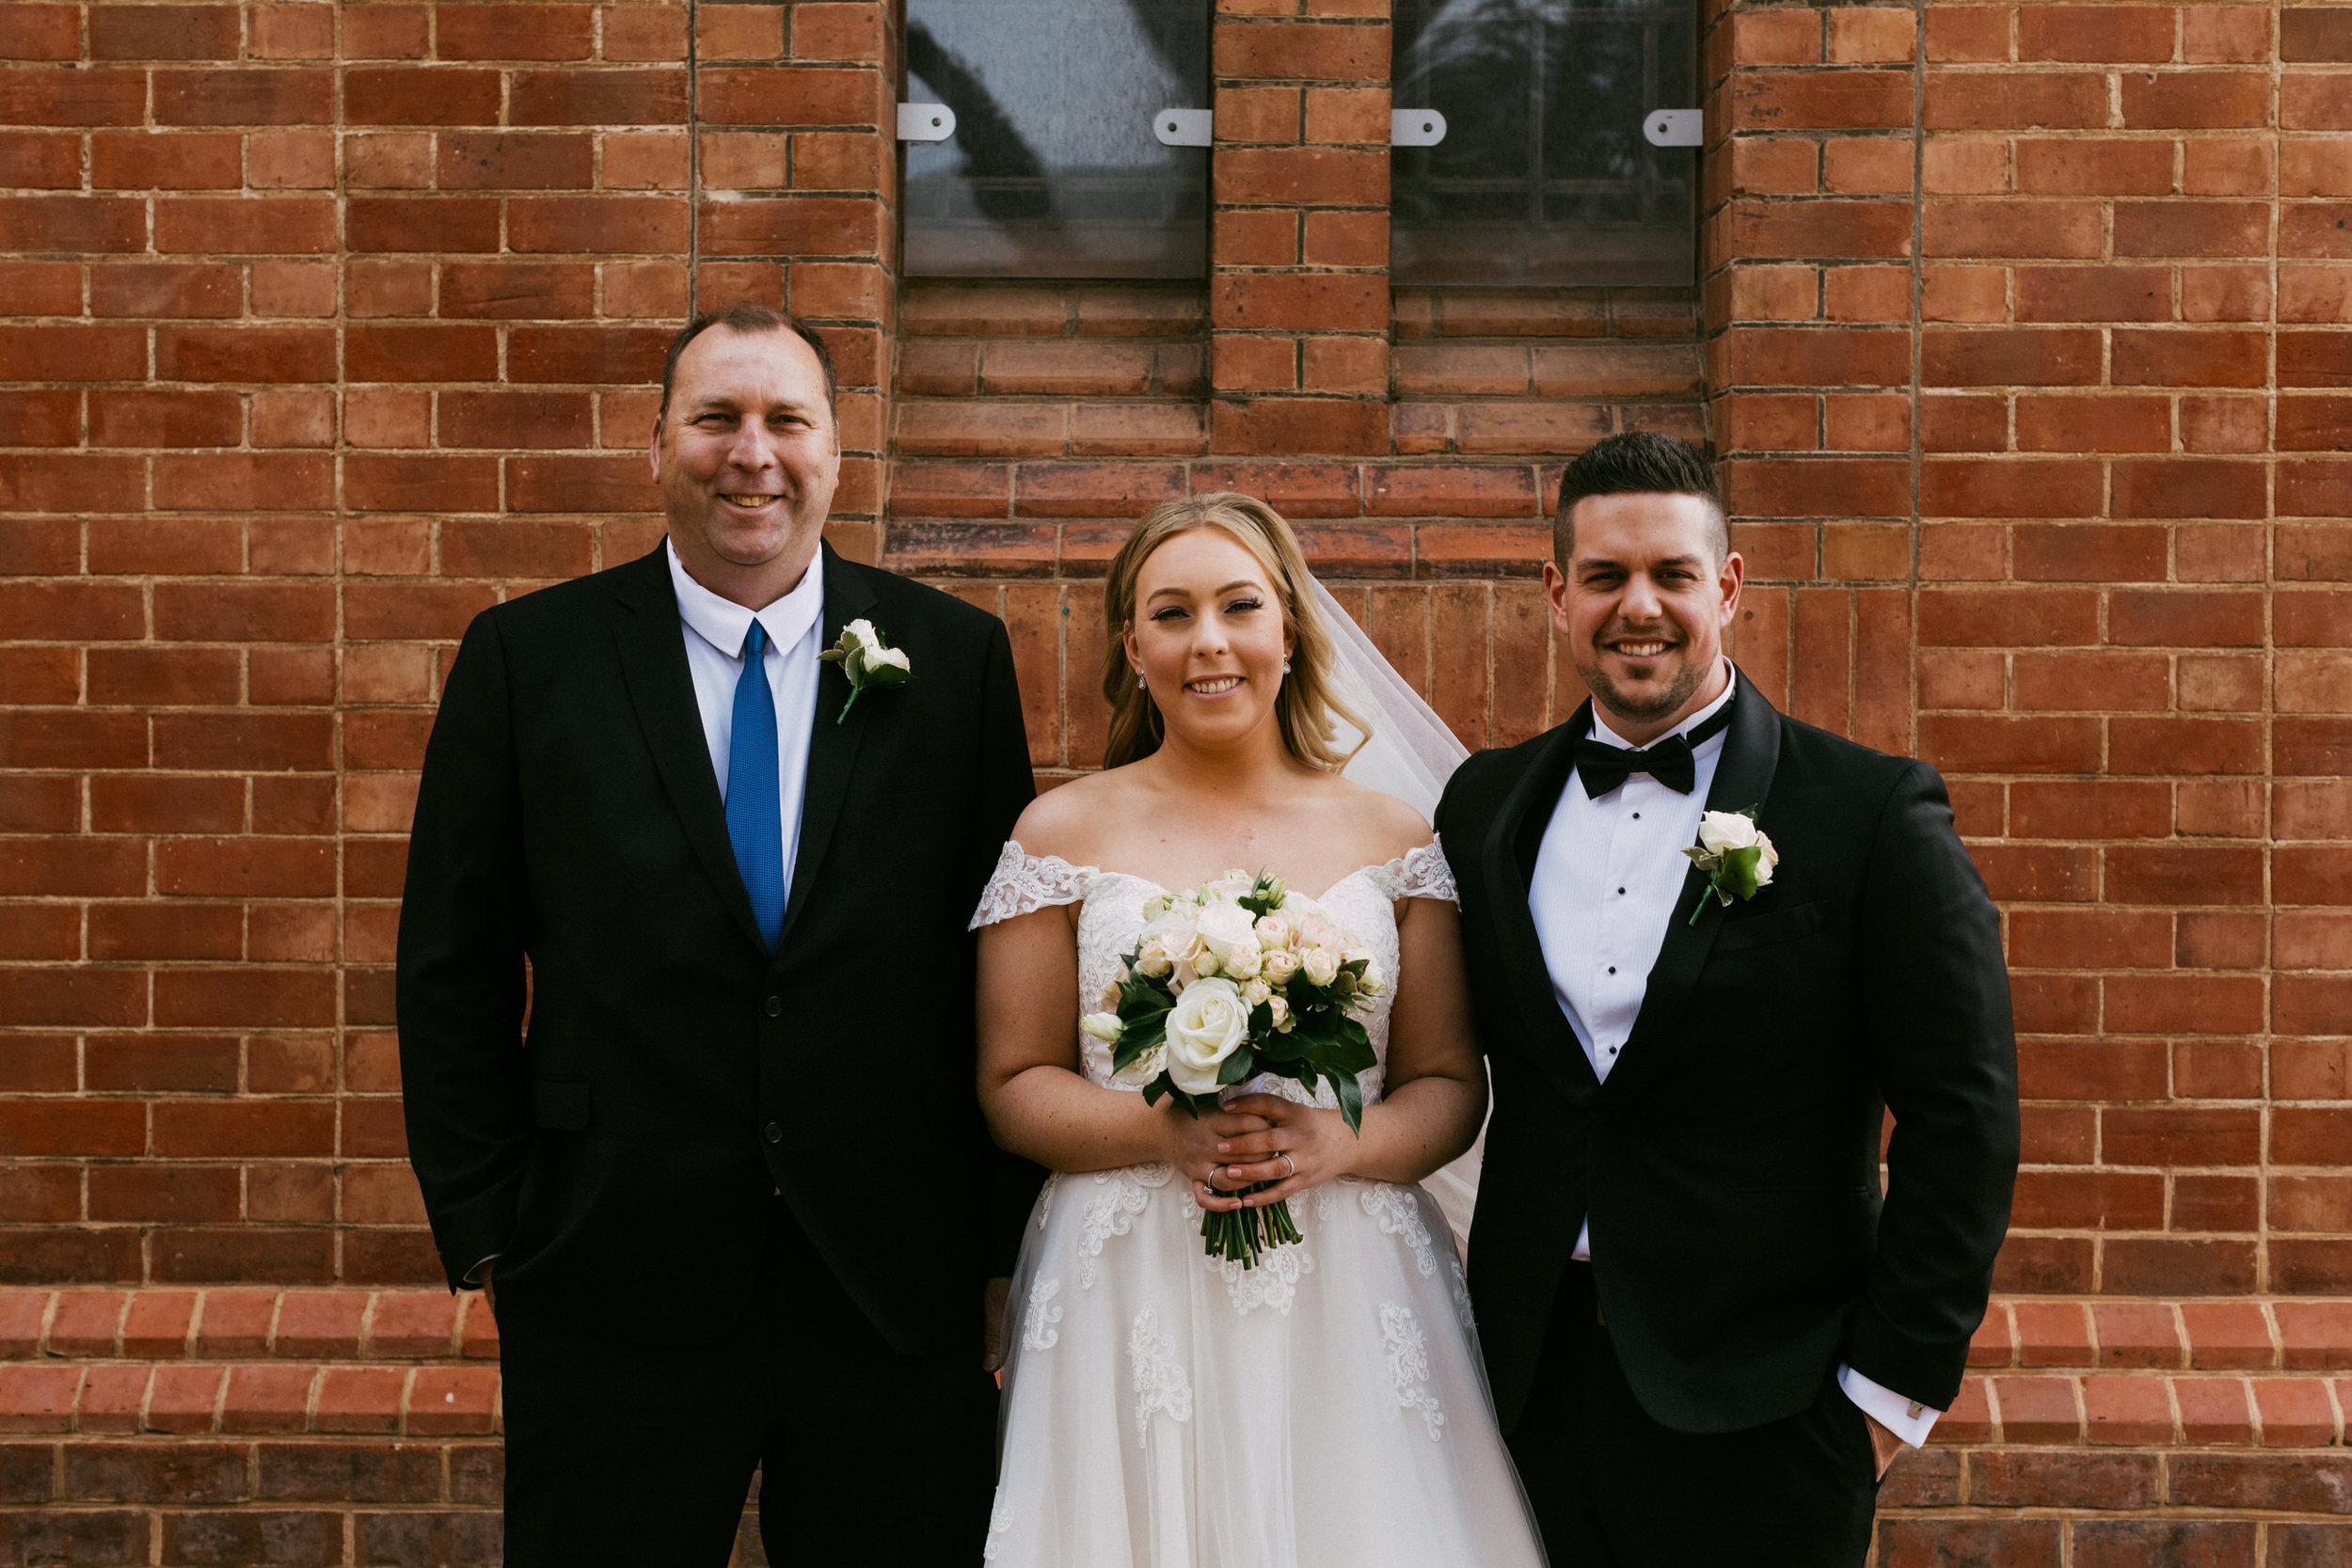 Adelaide Wedding Church Smoke Bomb Serafino 083.jpg